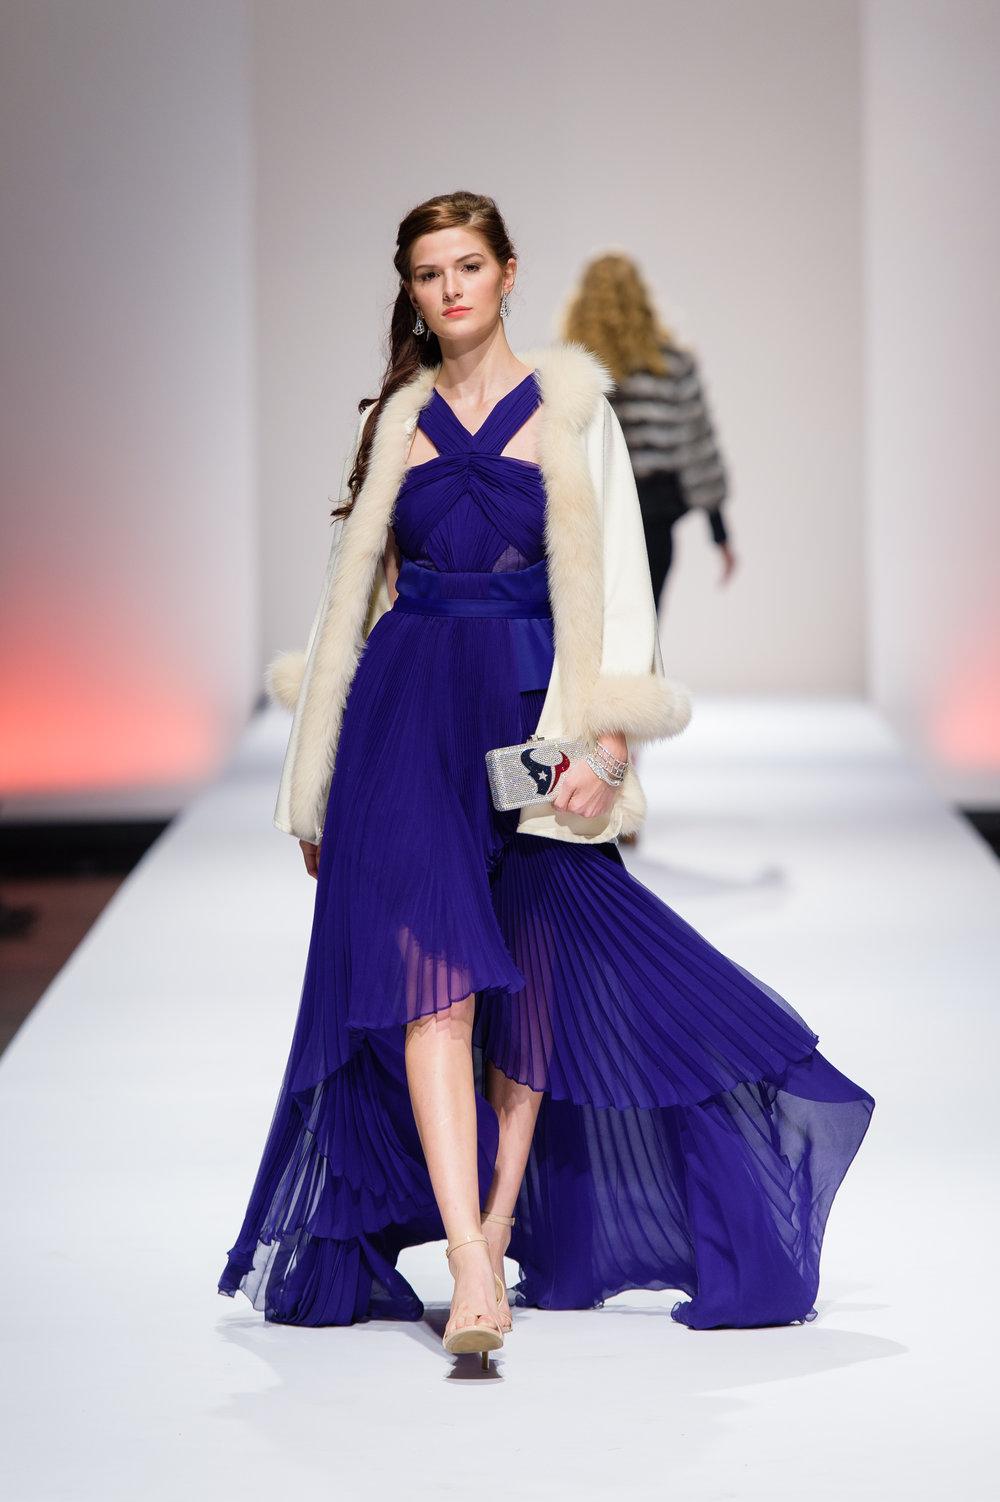 10142016-FashionXHouston-CarlosBarron-1100.jpg